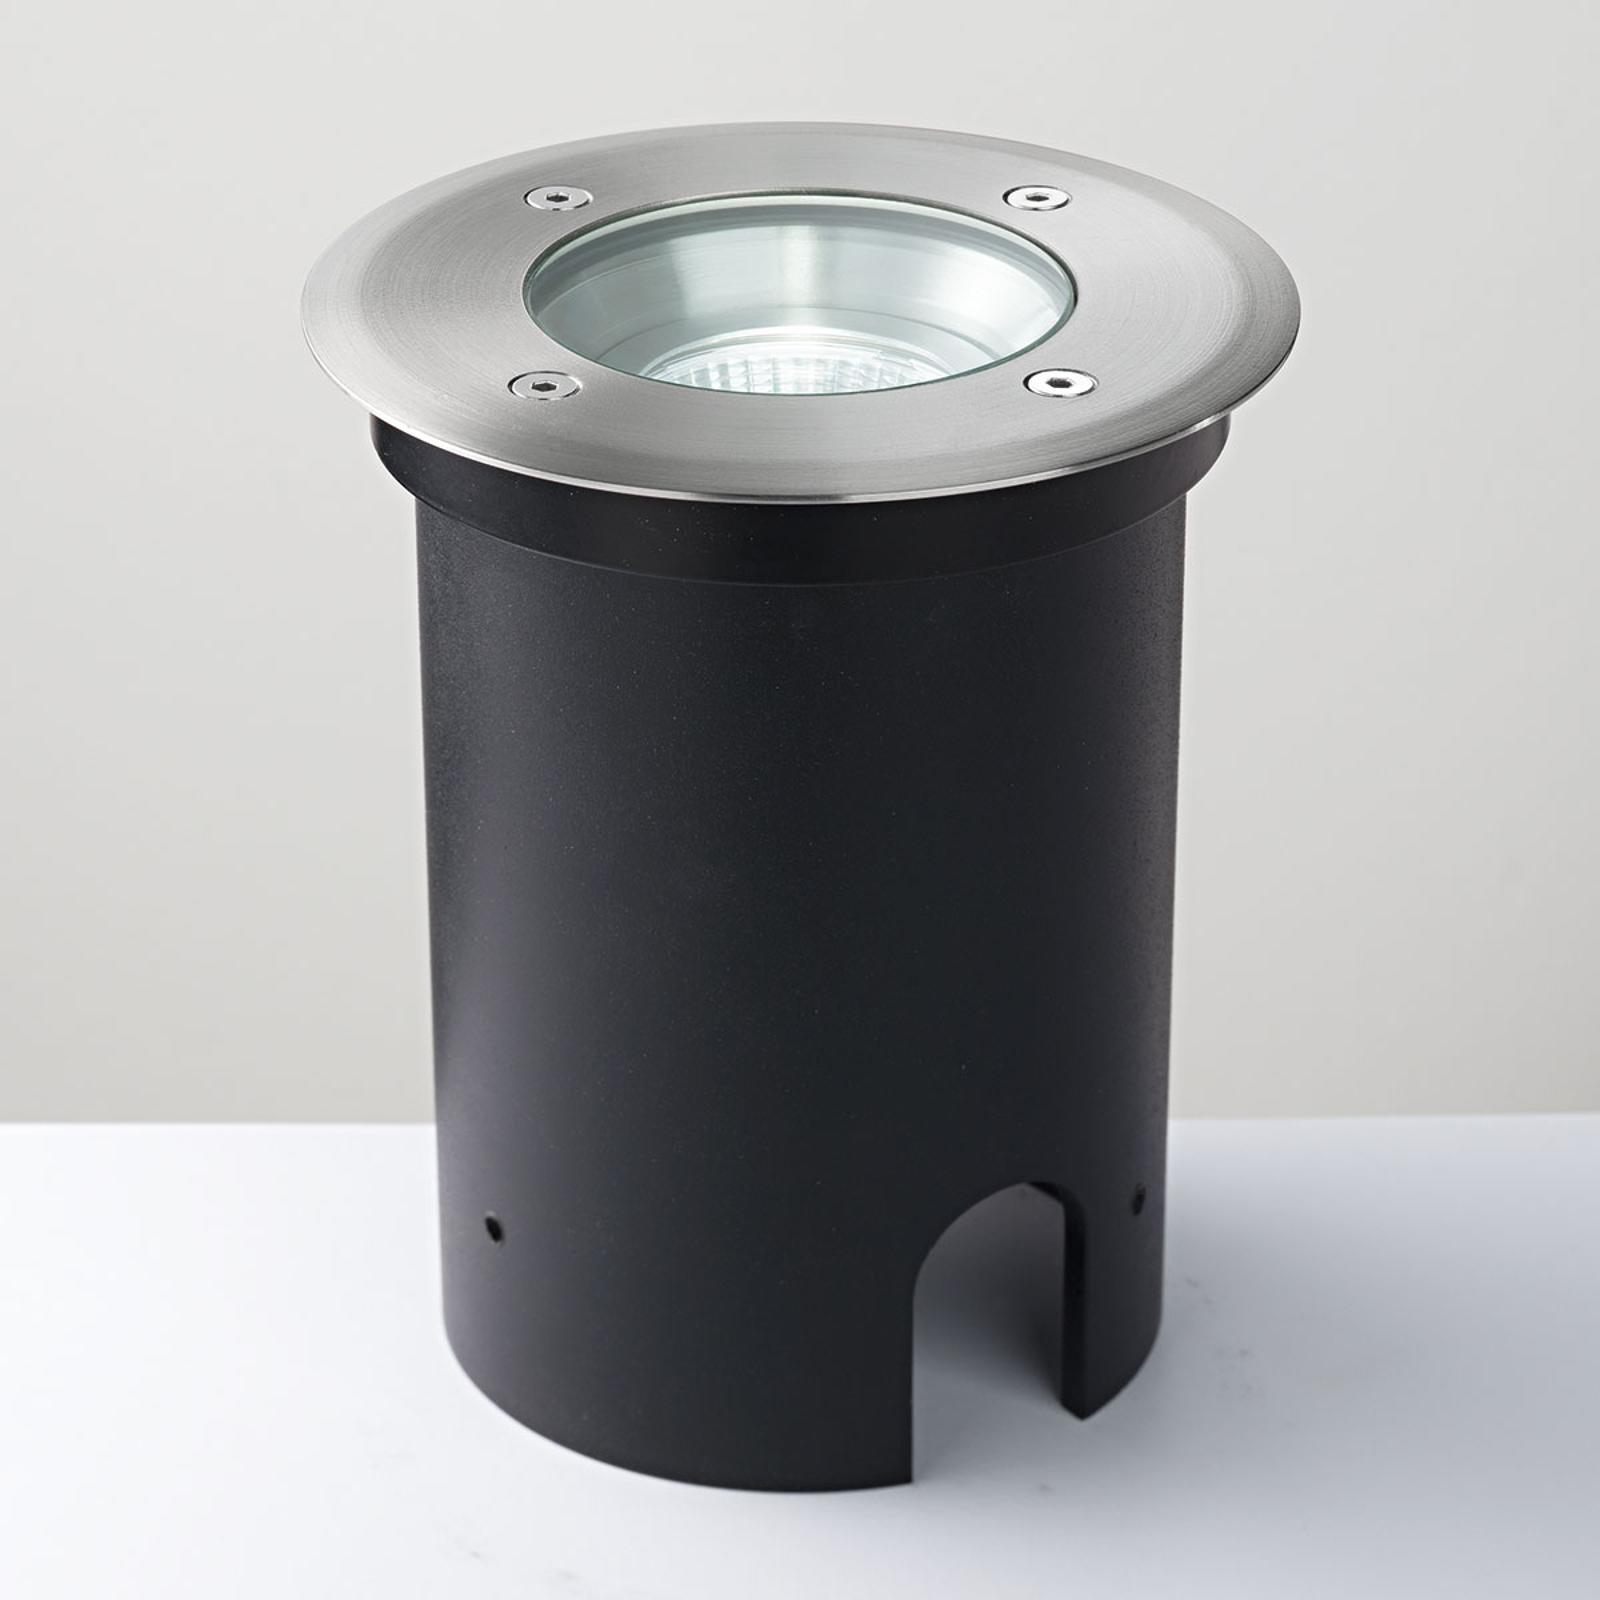 Scotty 3 LED recessed floor light, IP67_3023076_1